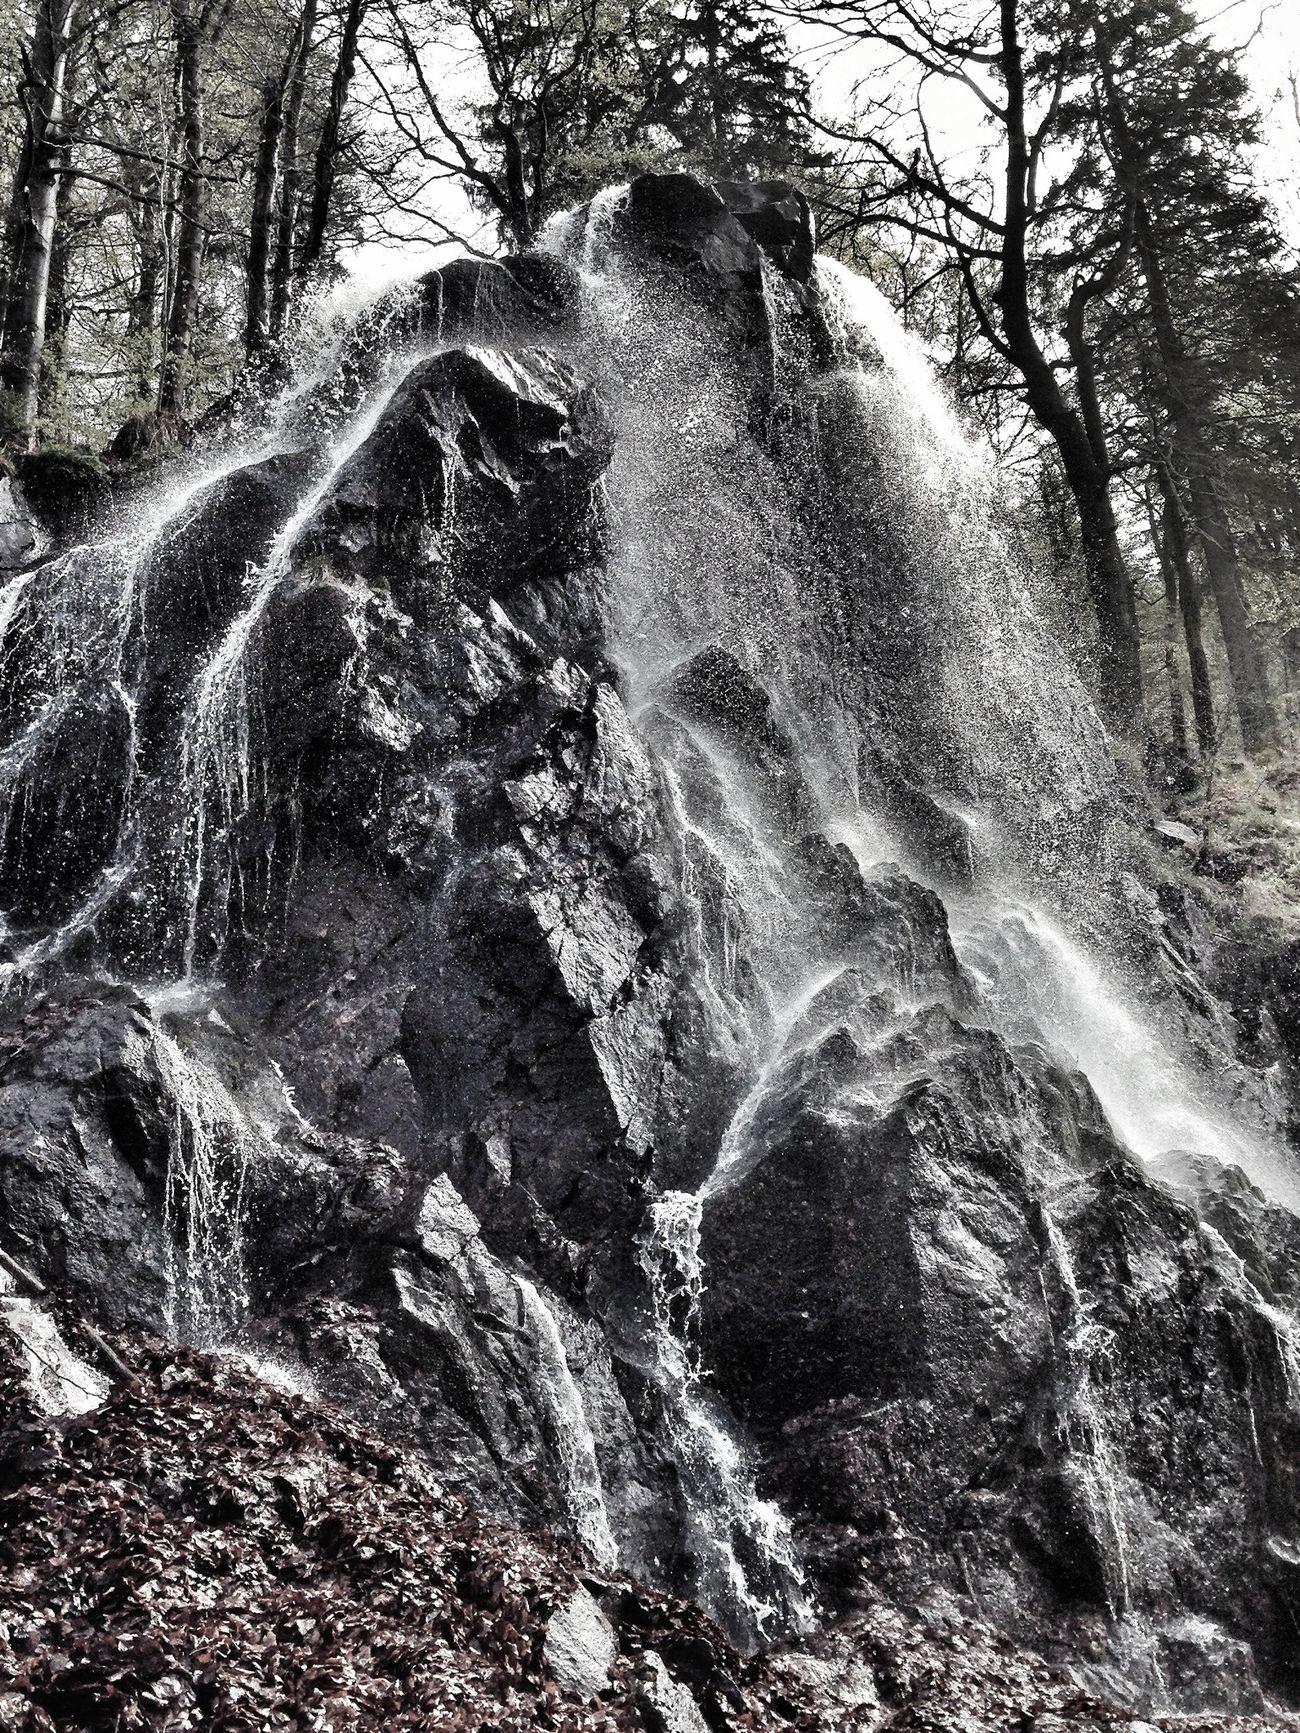 Niagara falls is everywhere EyeEm Nature Lover IPhoneography Walking Around Bad Harzburg